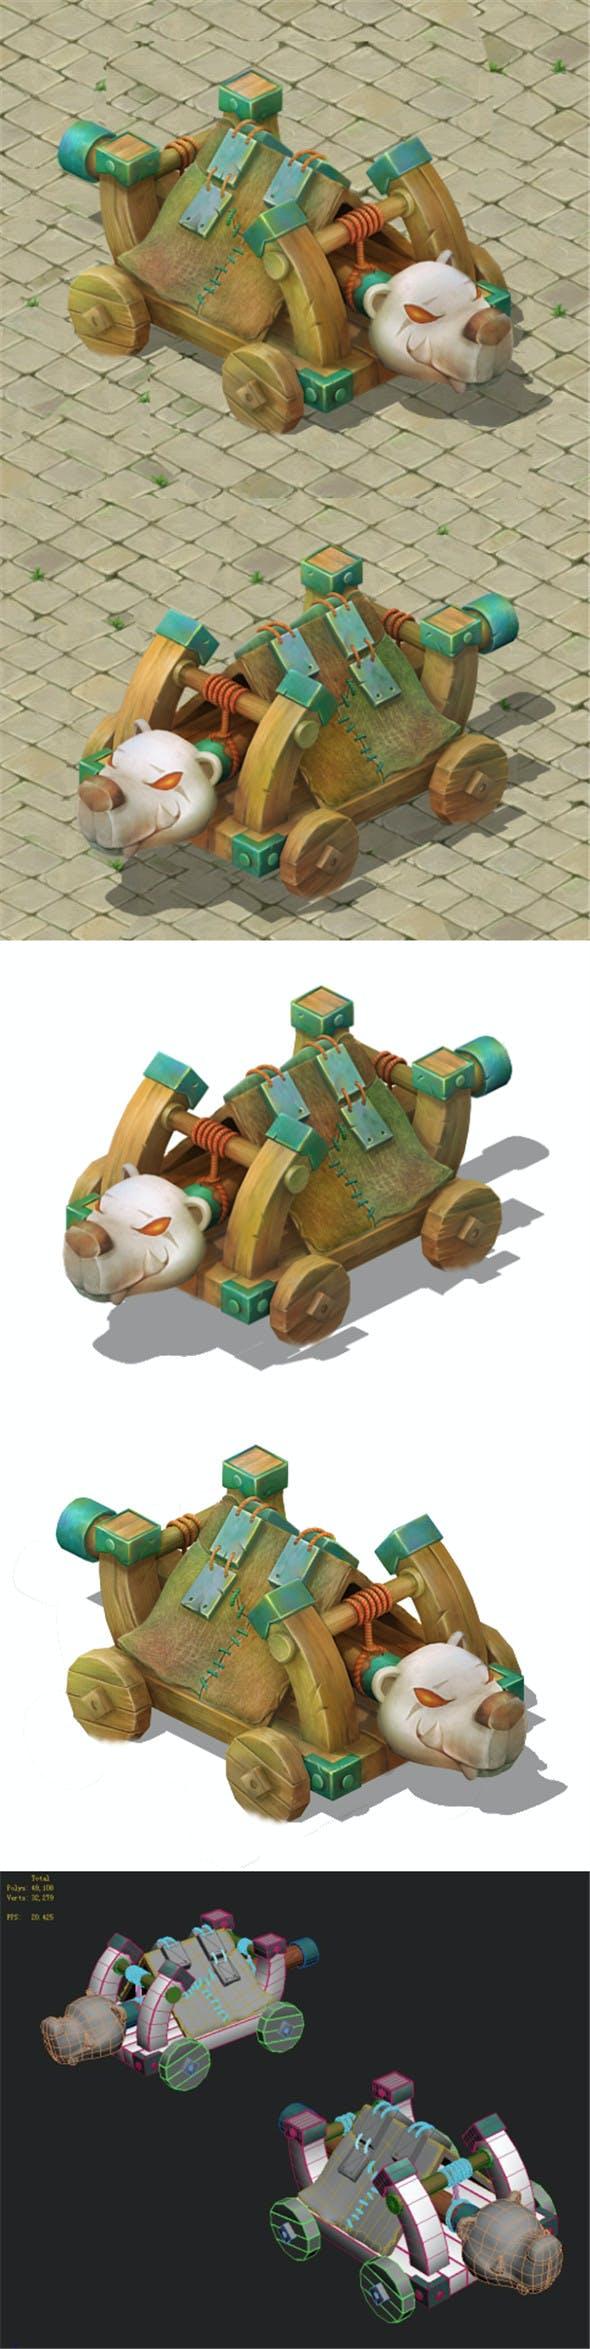 Cartoon version - Polar bear siege car - 3DOcean Item for Sale